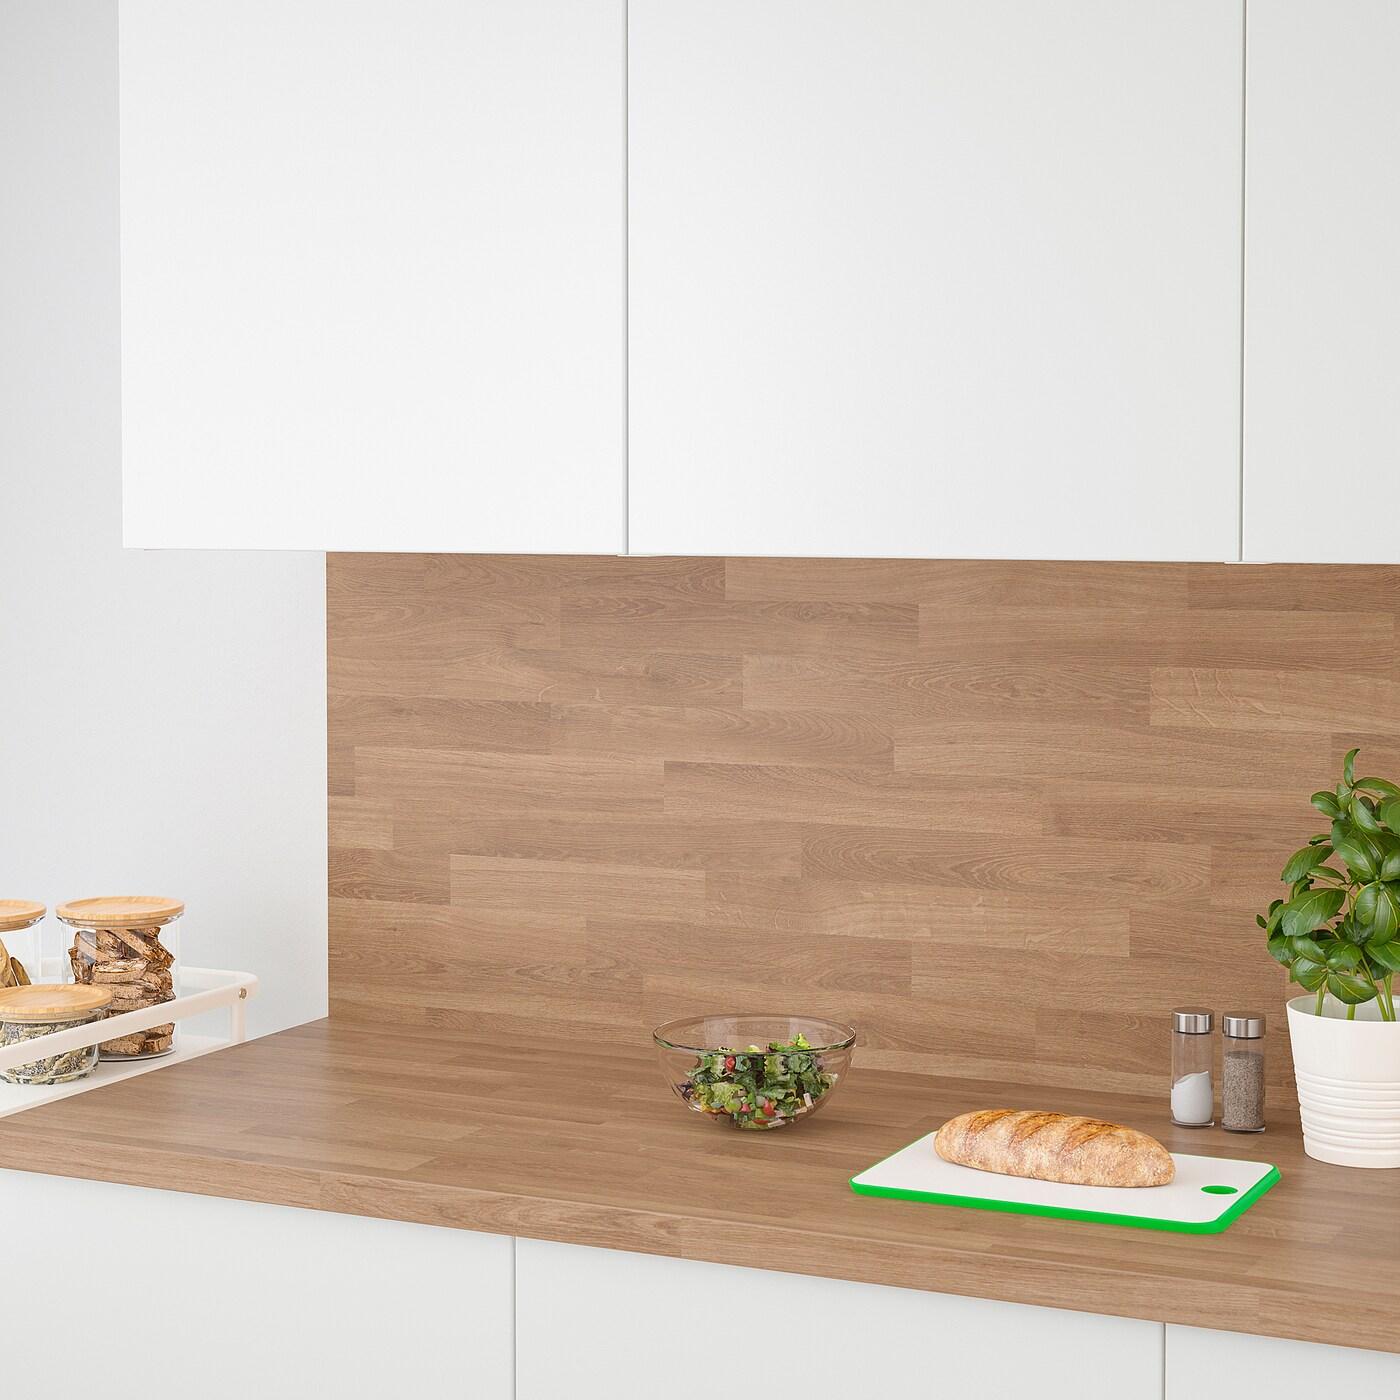 Sibbarp Maatwerk Wandpaneel Eikenpatroon Laminaat 1 M X1 3 Cm Ikea